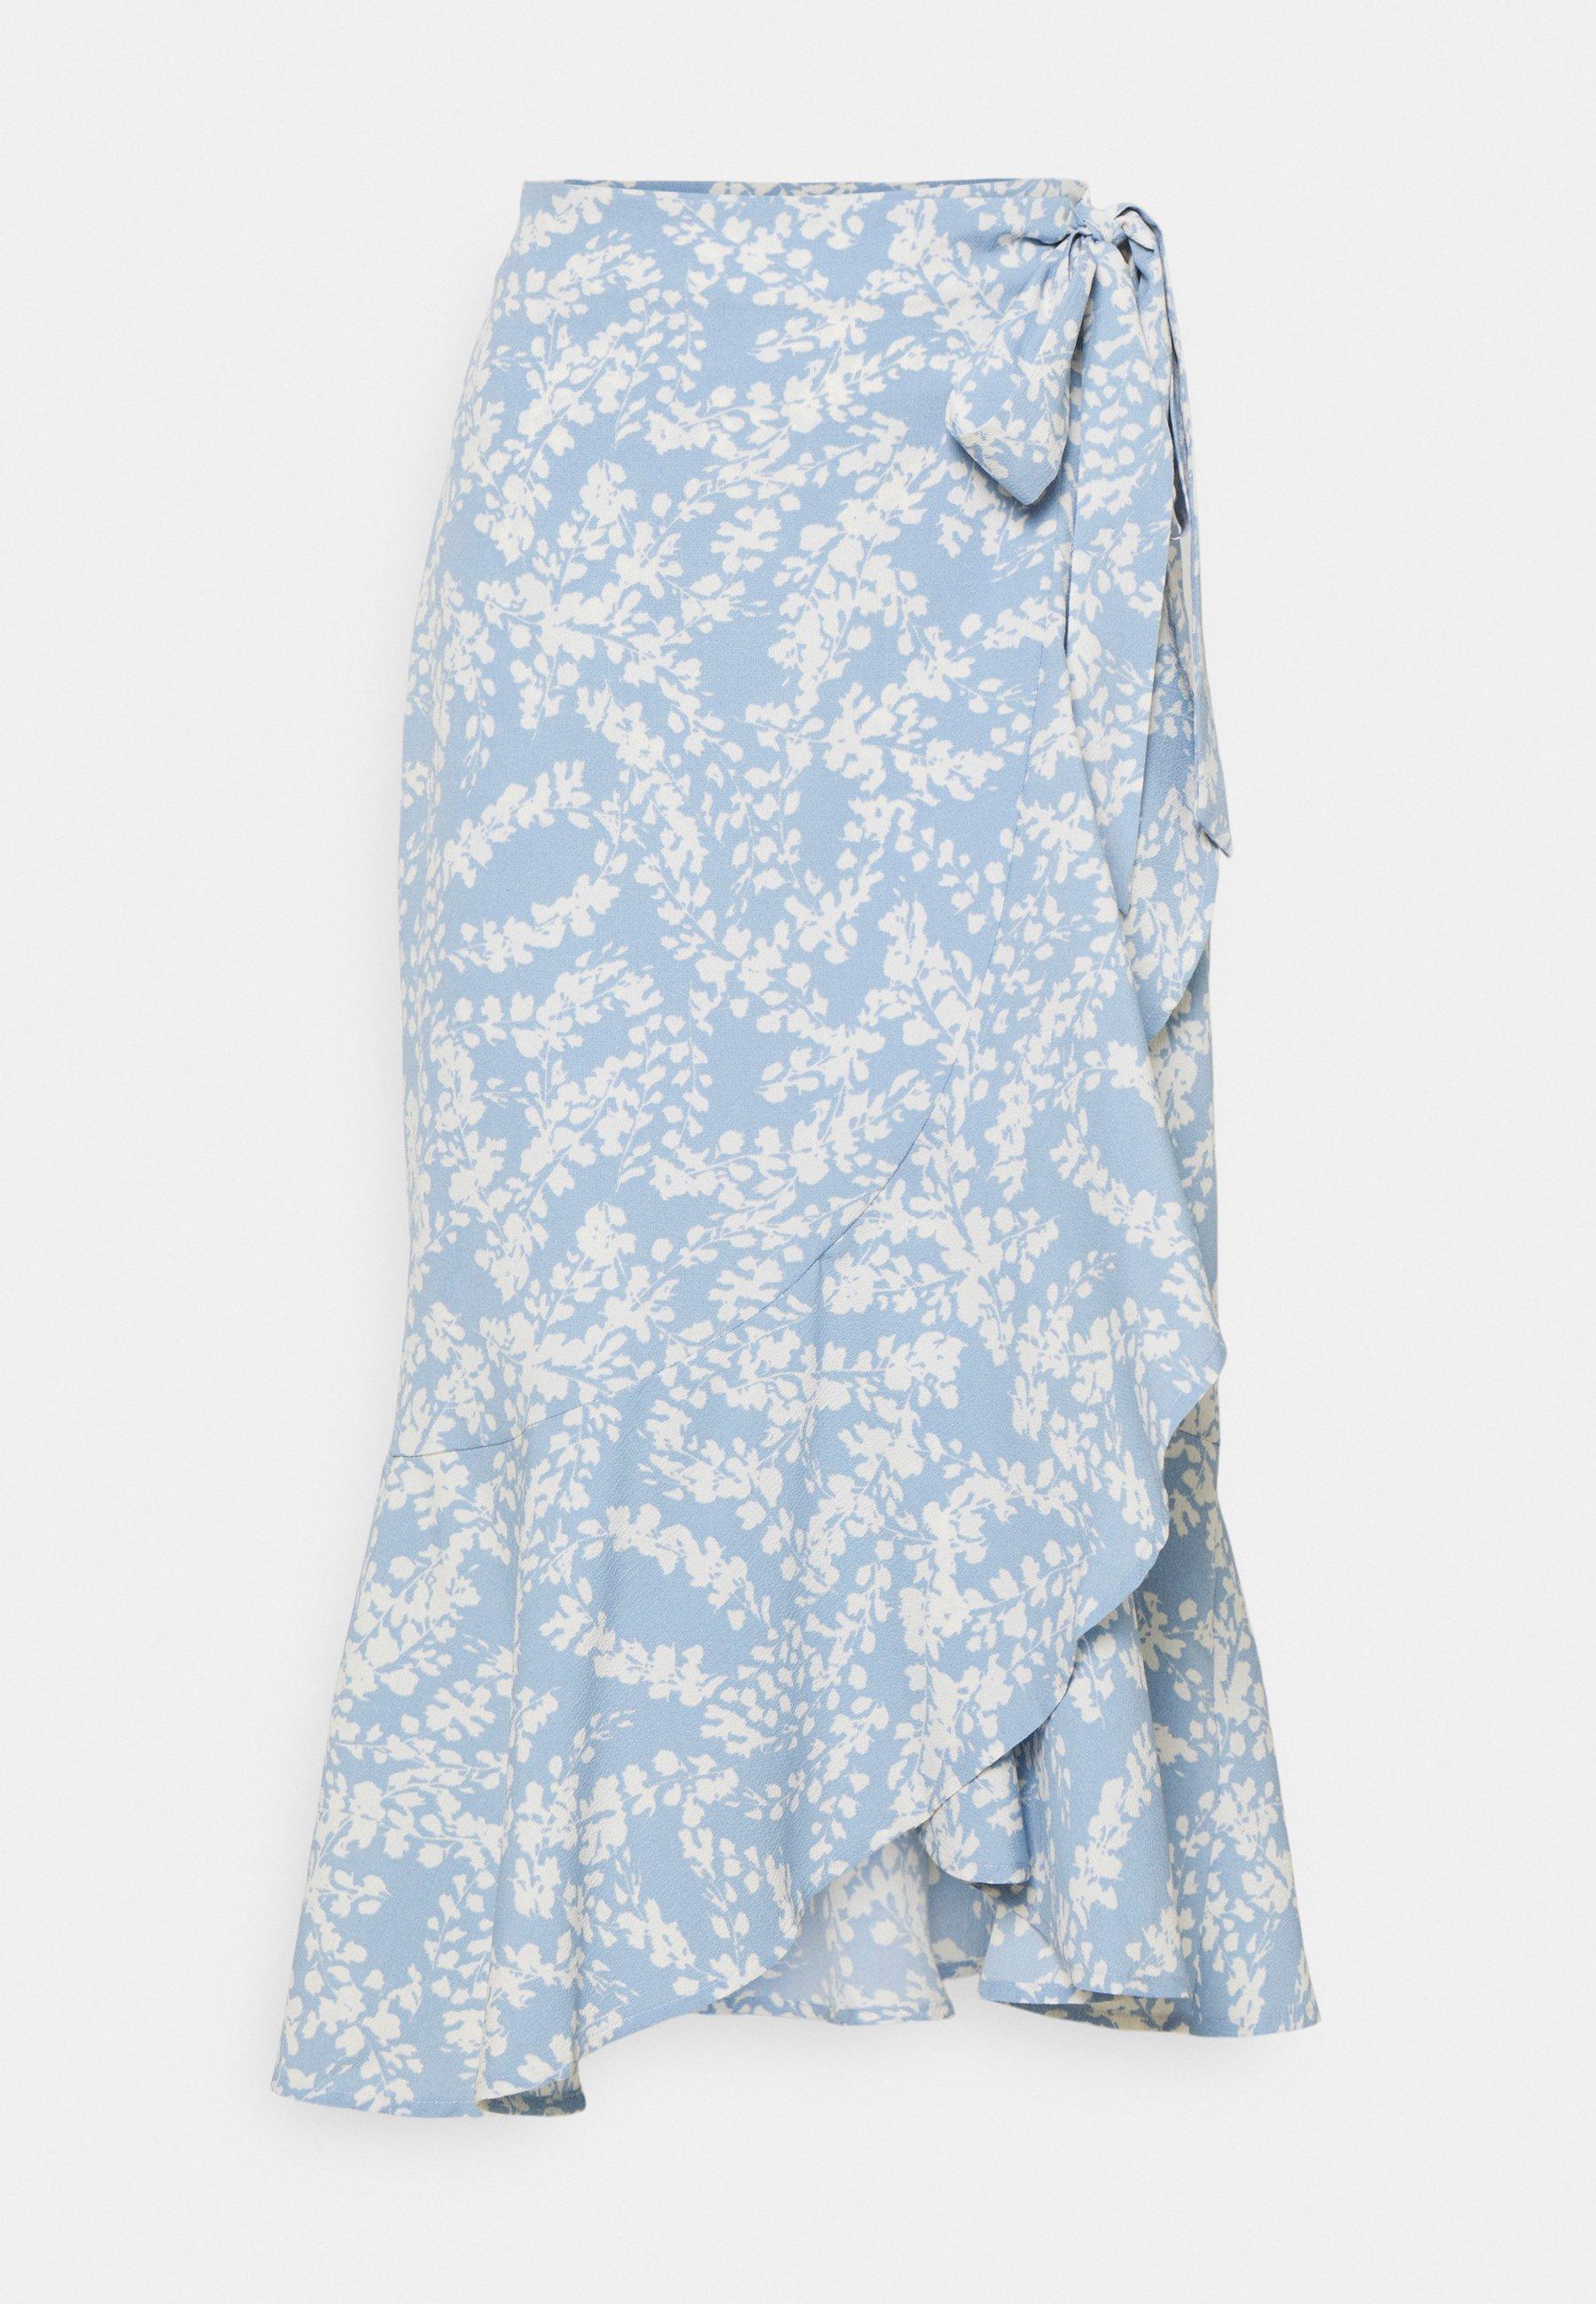 Femme FRANIE WRAP SKIRT - Jupe portefeuille - blue